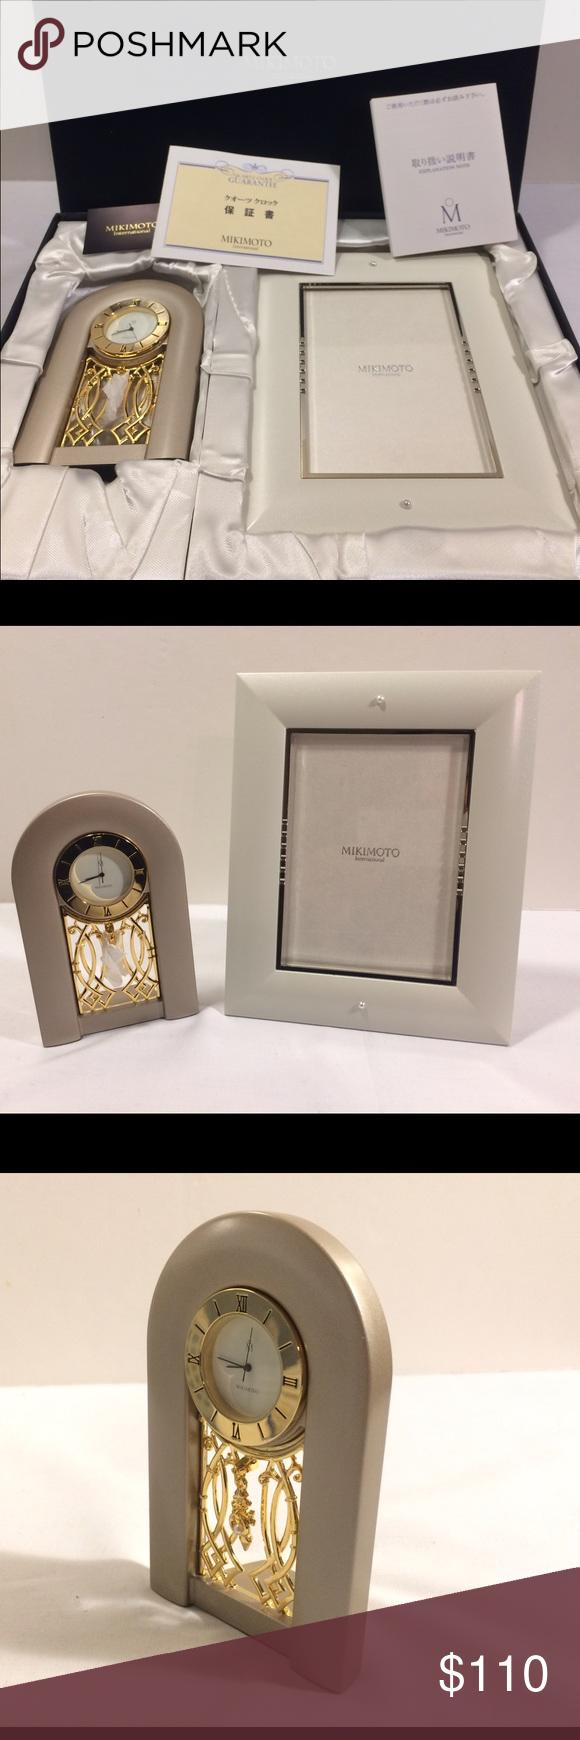 MIKIMOTO Art quartz Clock & Picture Frame New   Baby pearls, Pearls ...